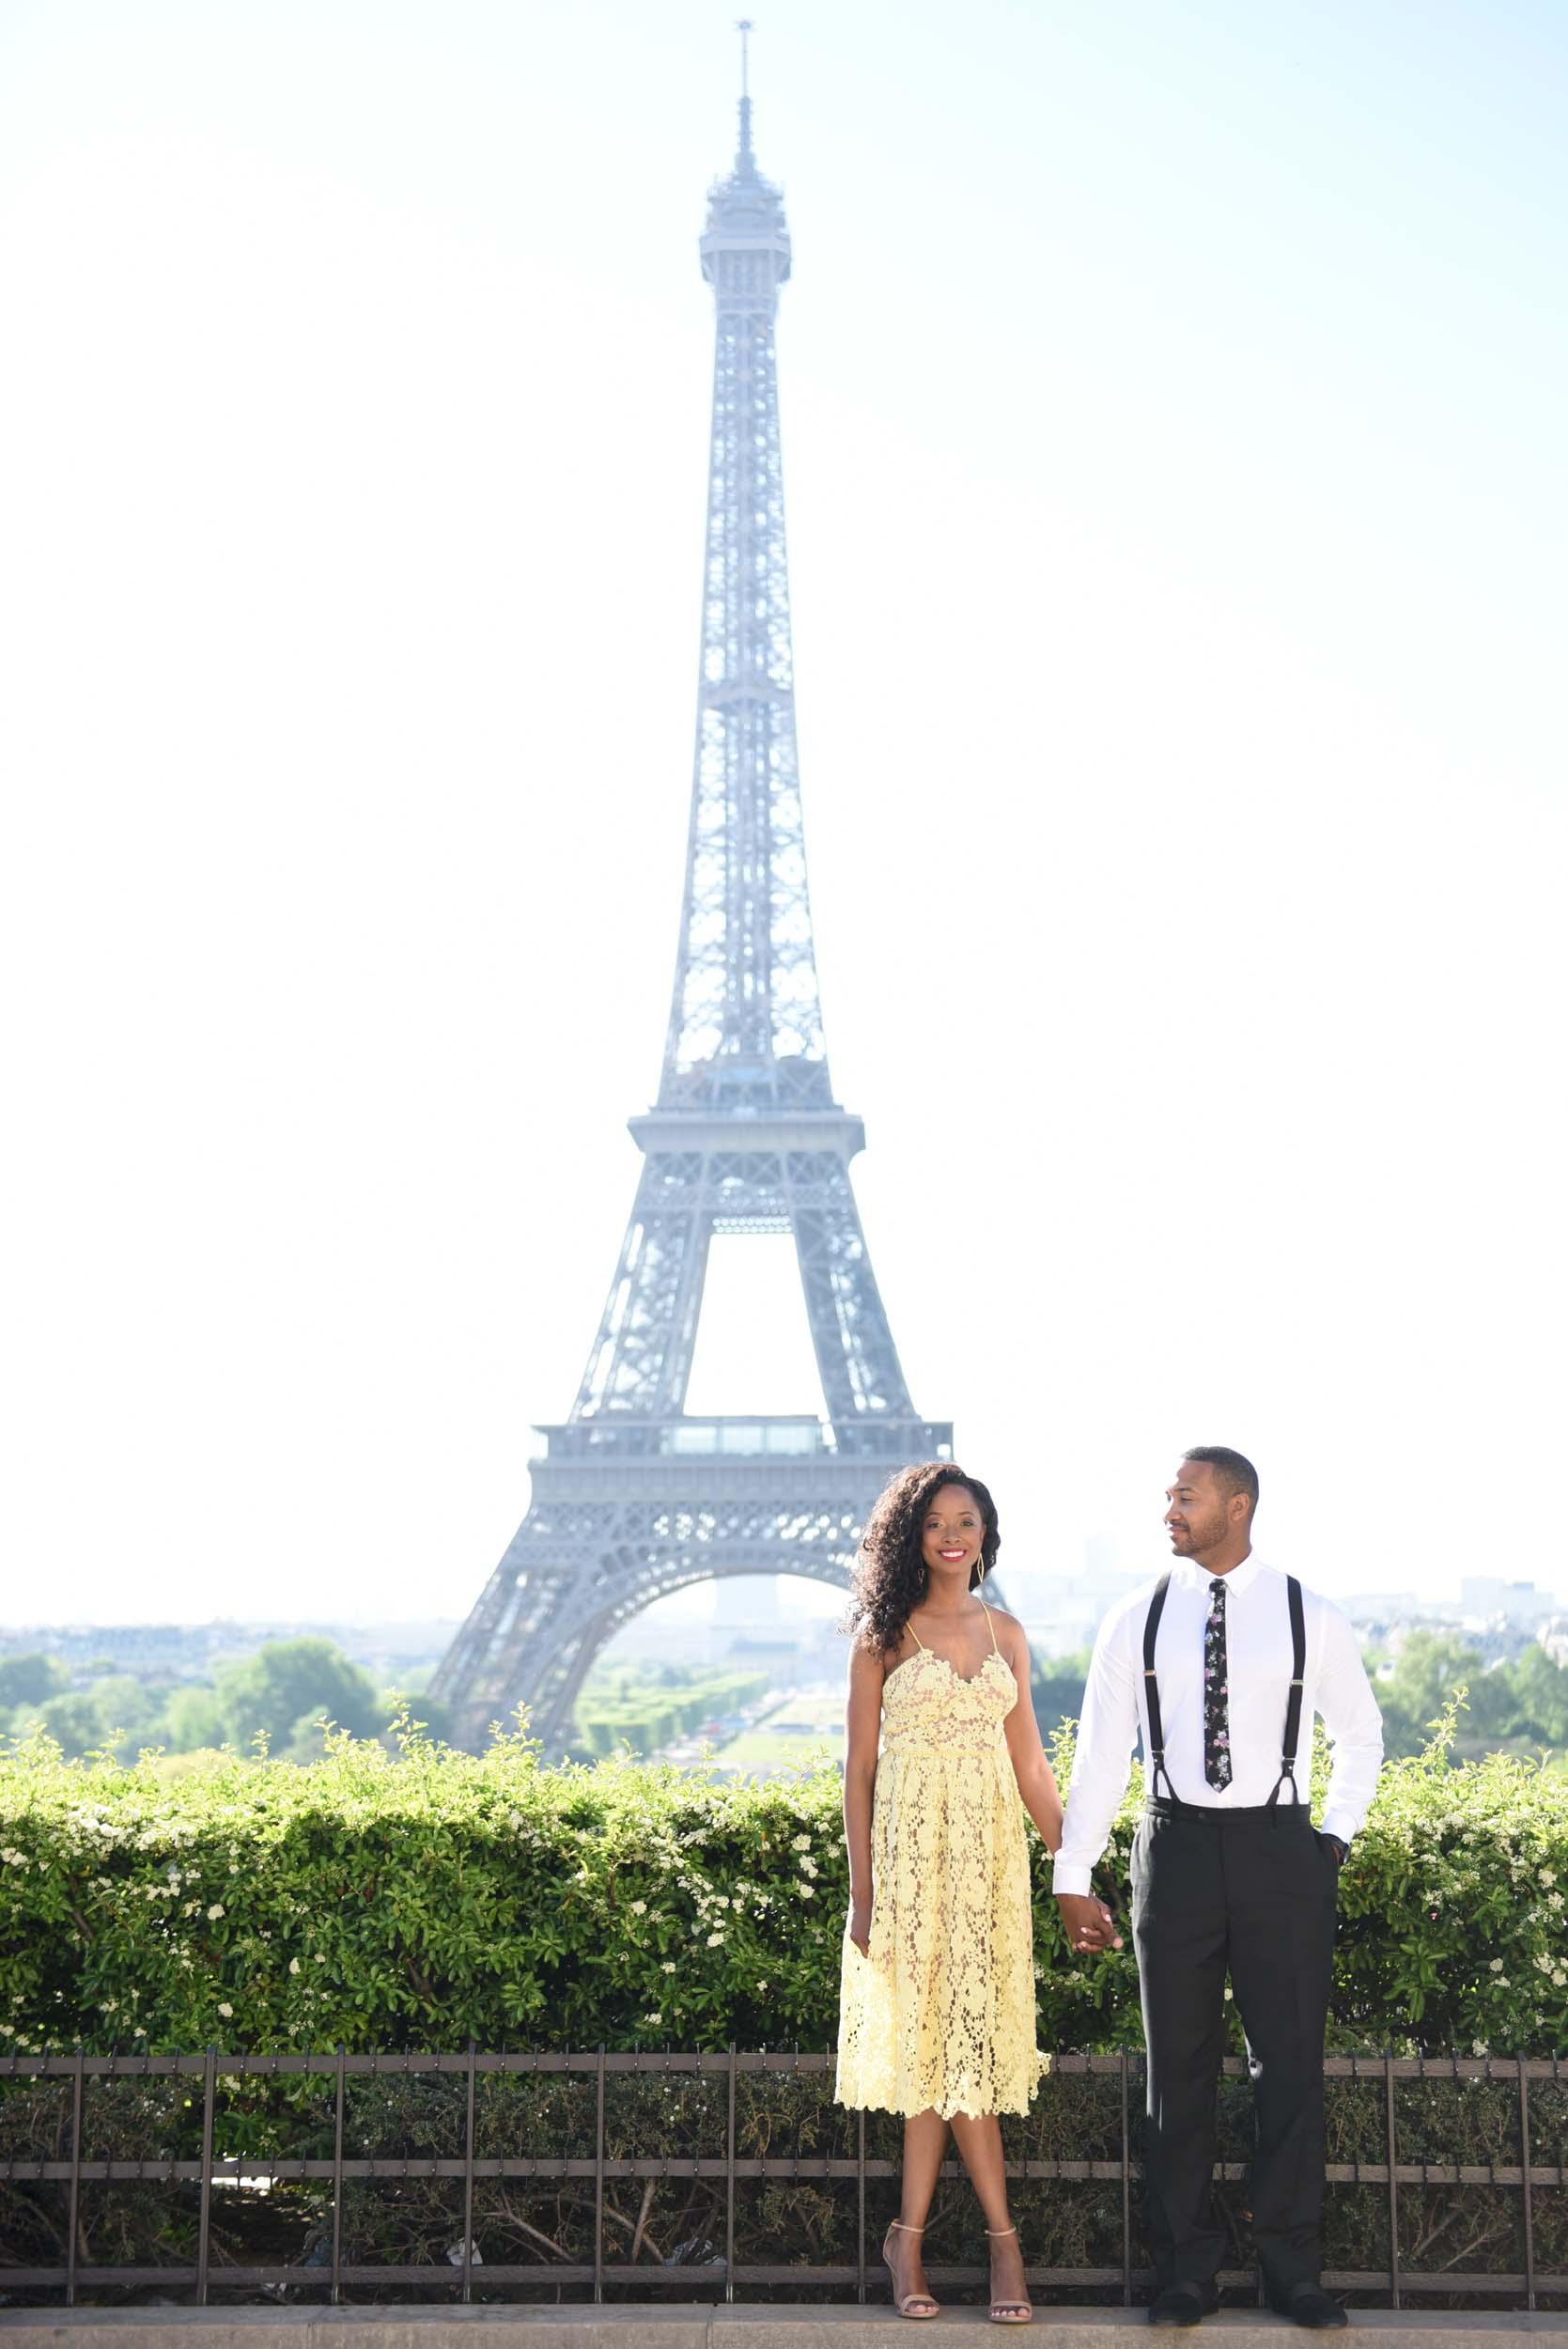 Dating Guy Paris. Omul care cauta o femeie in Aveyron